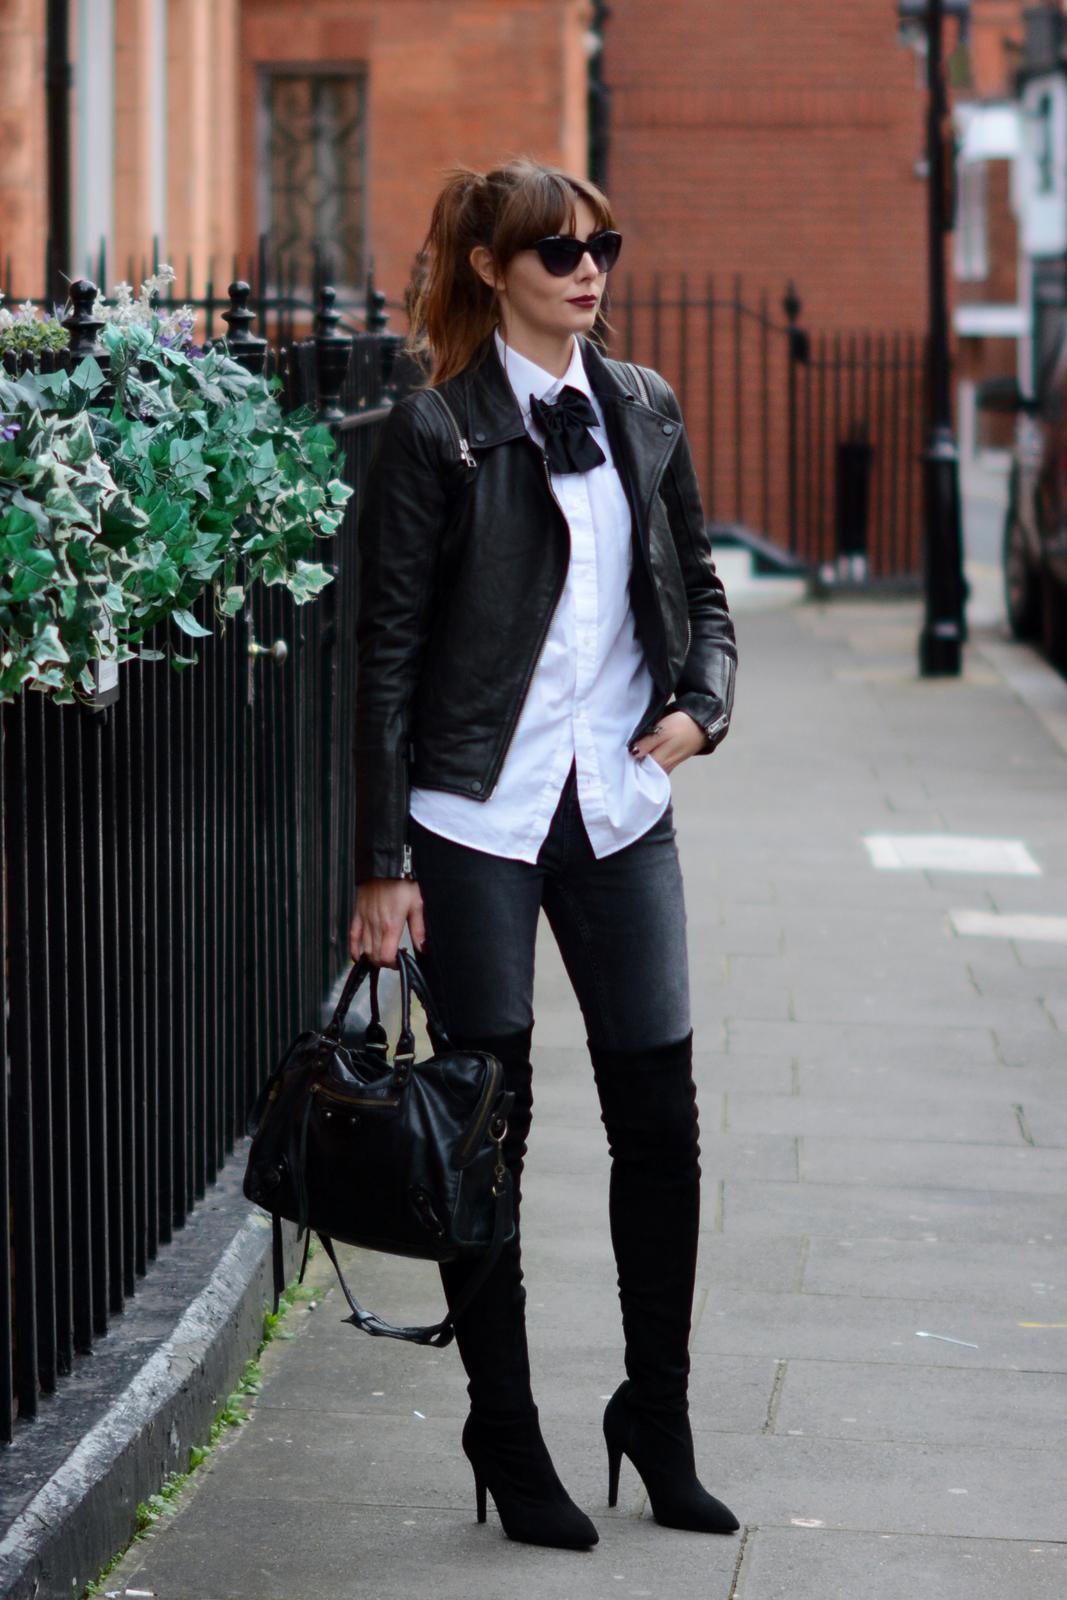 EJSTYLE - Black acid wash skinny jeans, Next heeled OTK thigh high boots, Balenciaga bag, all saints leather biker jacket, white shirt, black bowtie, Saint Laurent Street style, London